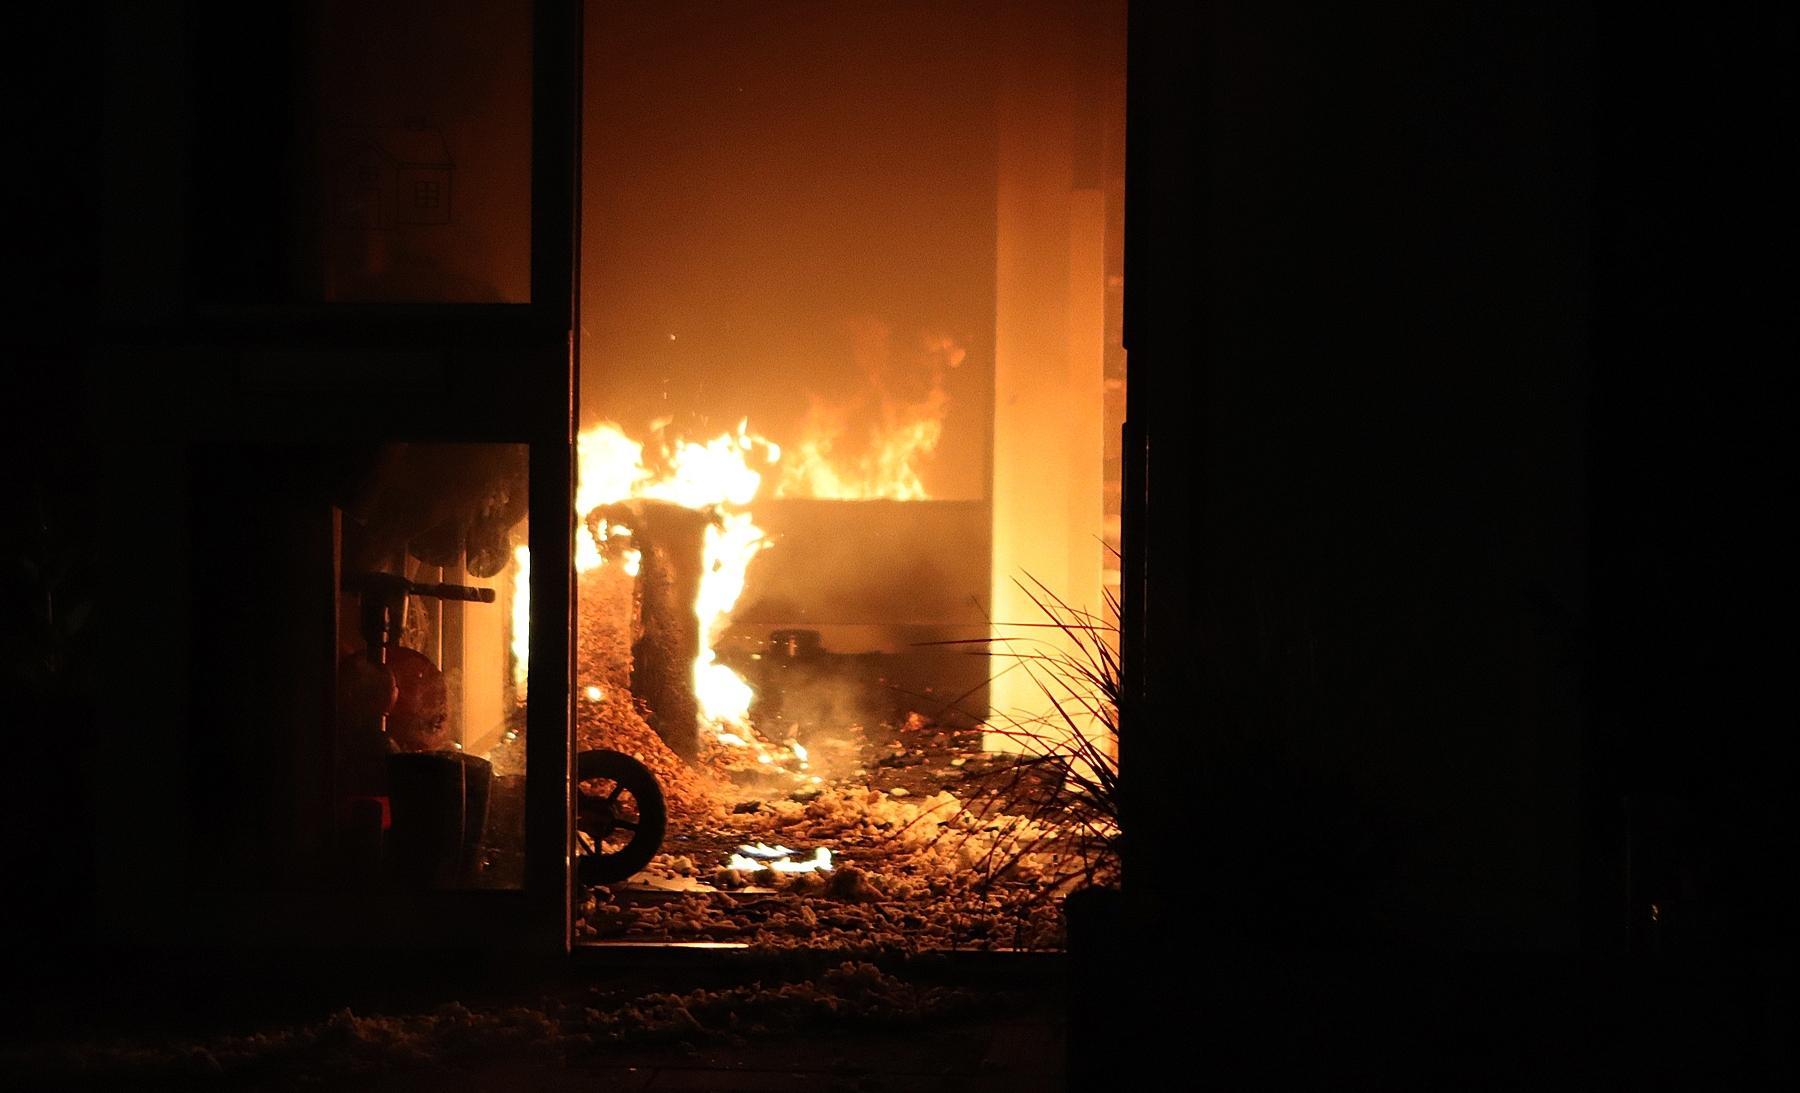 Felle brand in gang van woning in Noordwijkerhout